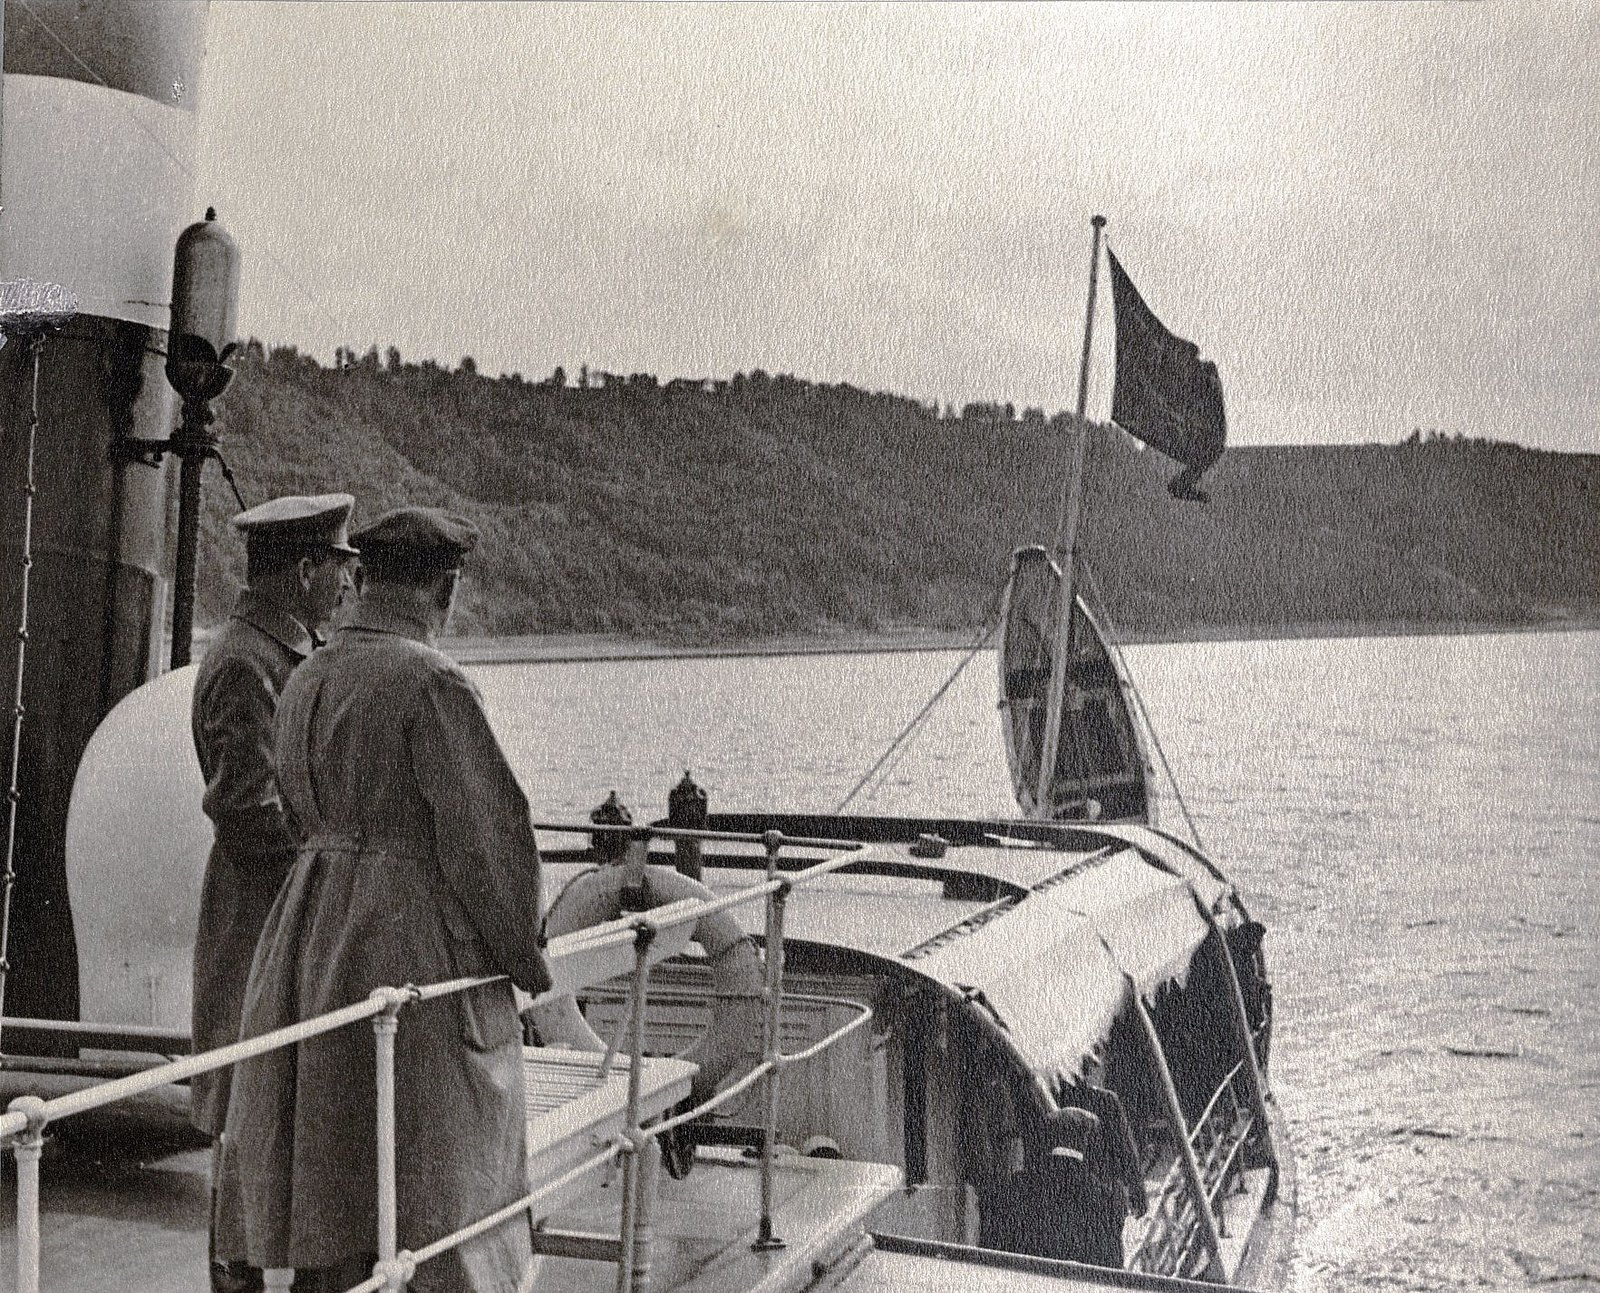 38. И.В. Сталин, К.Е. Ворошилов на теплоходе. Август 1933